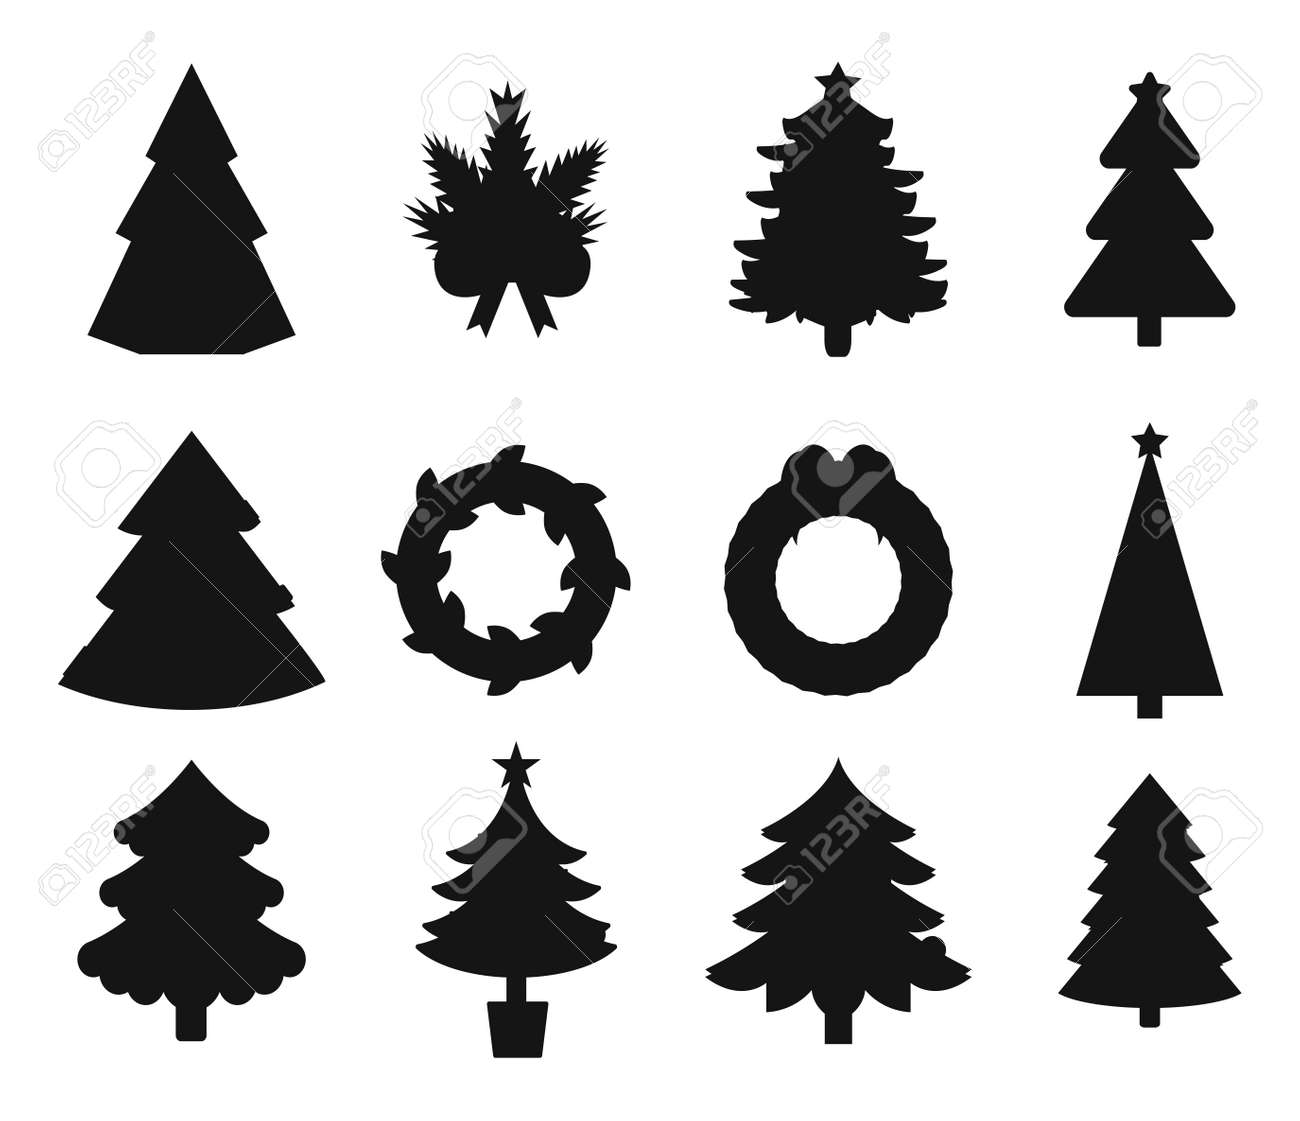 Christmas Tree Black Icons Set Christmas Tree Vector New Year